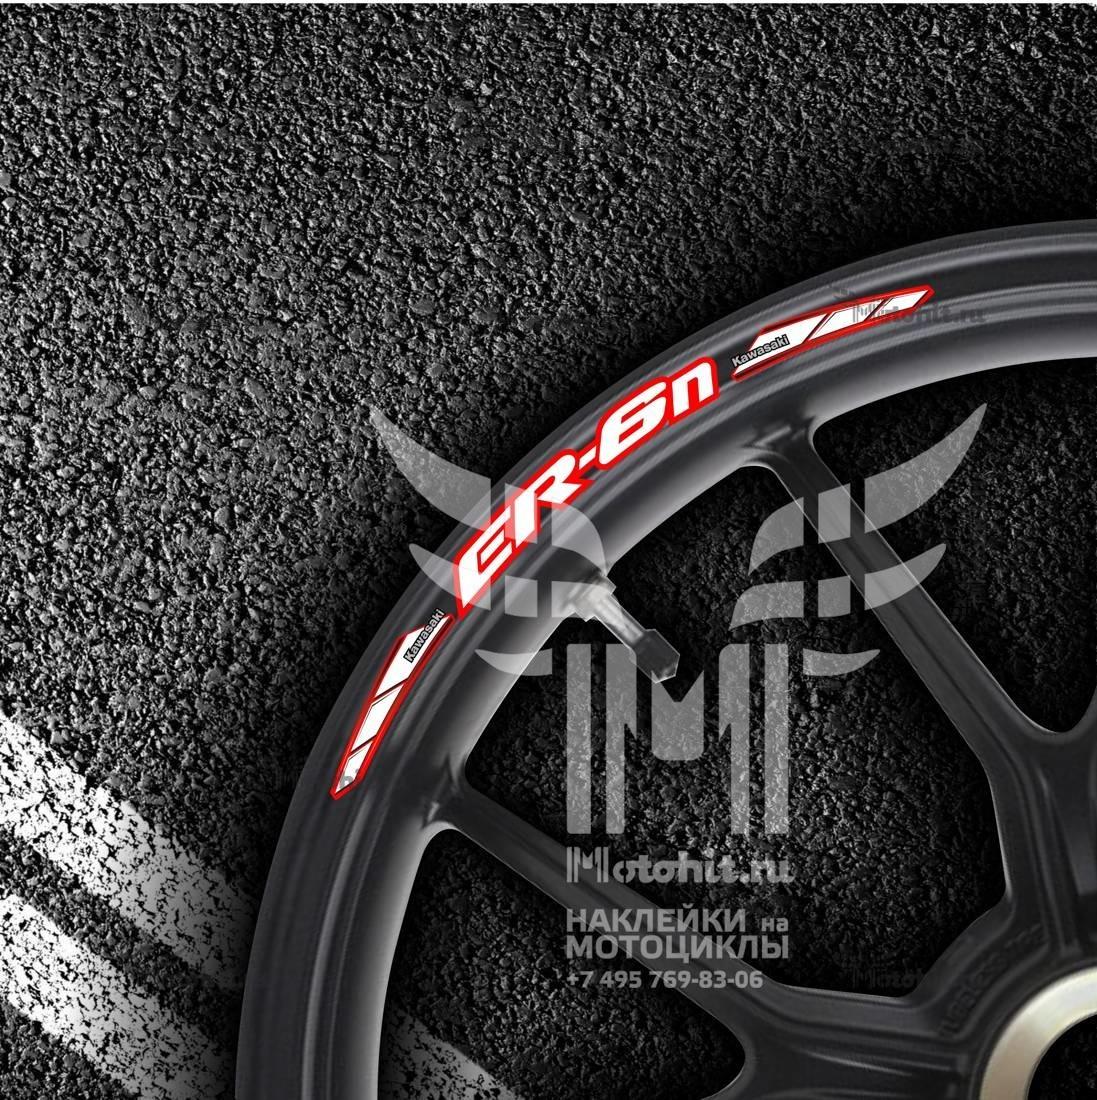 Комплект наклеек на обод колеса мотоцикла KAWASAKI ER-6n